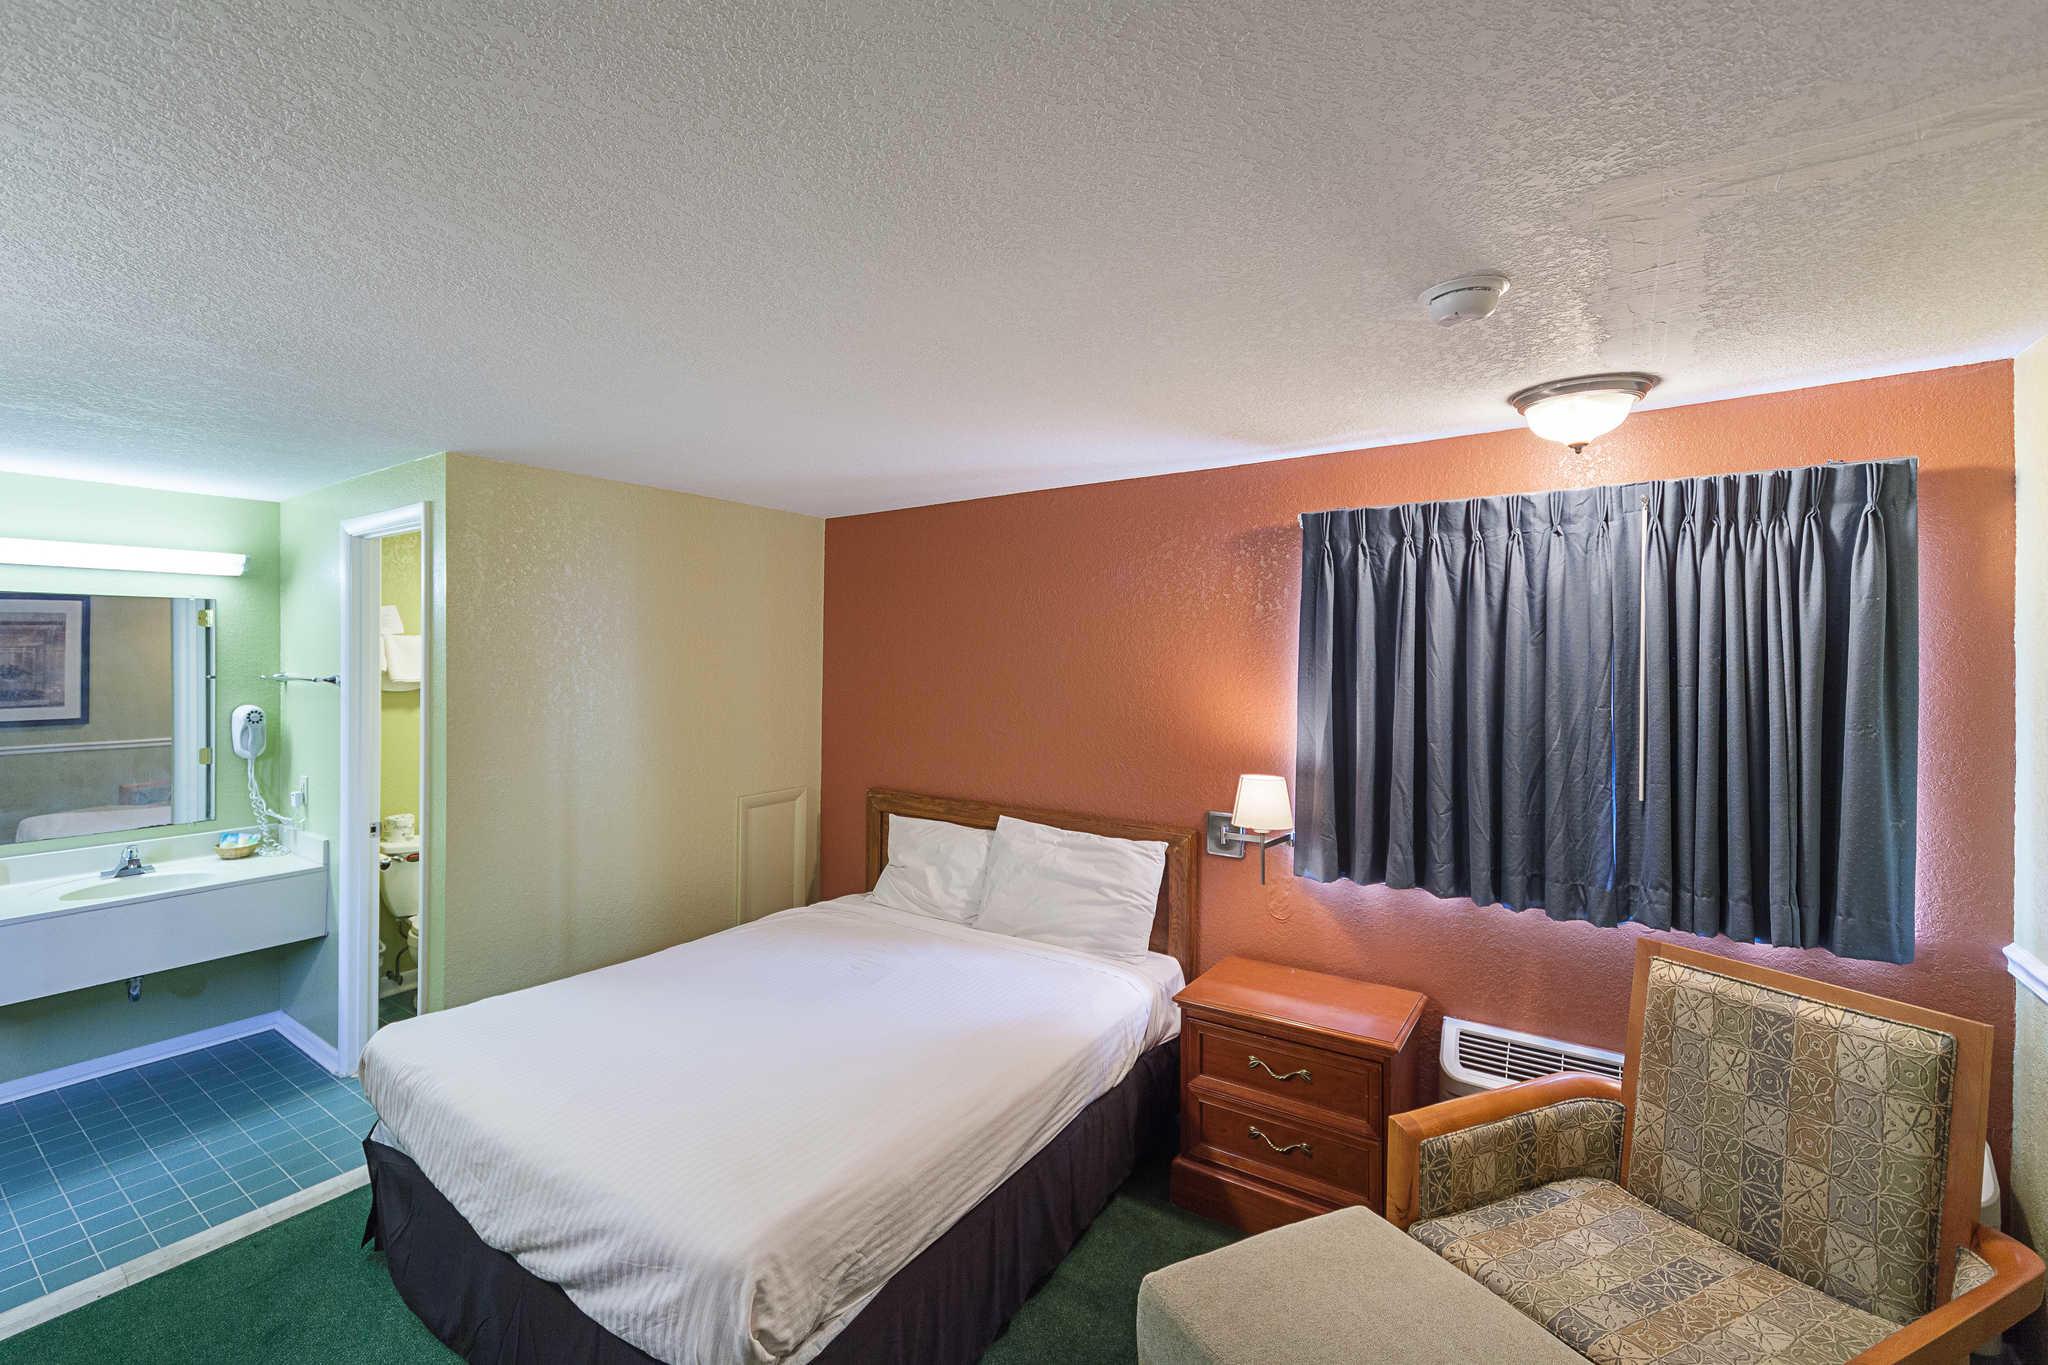 Rodeway Inn image 19